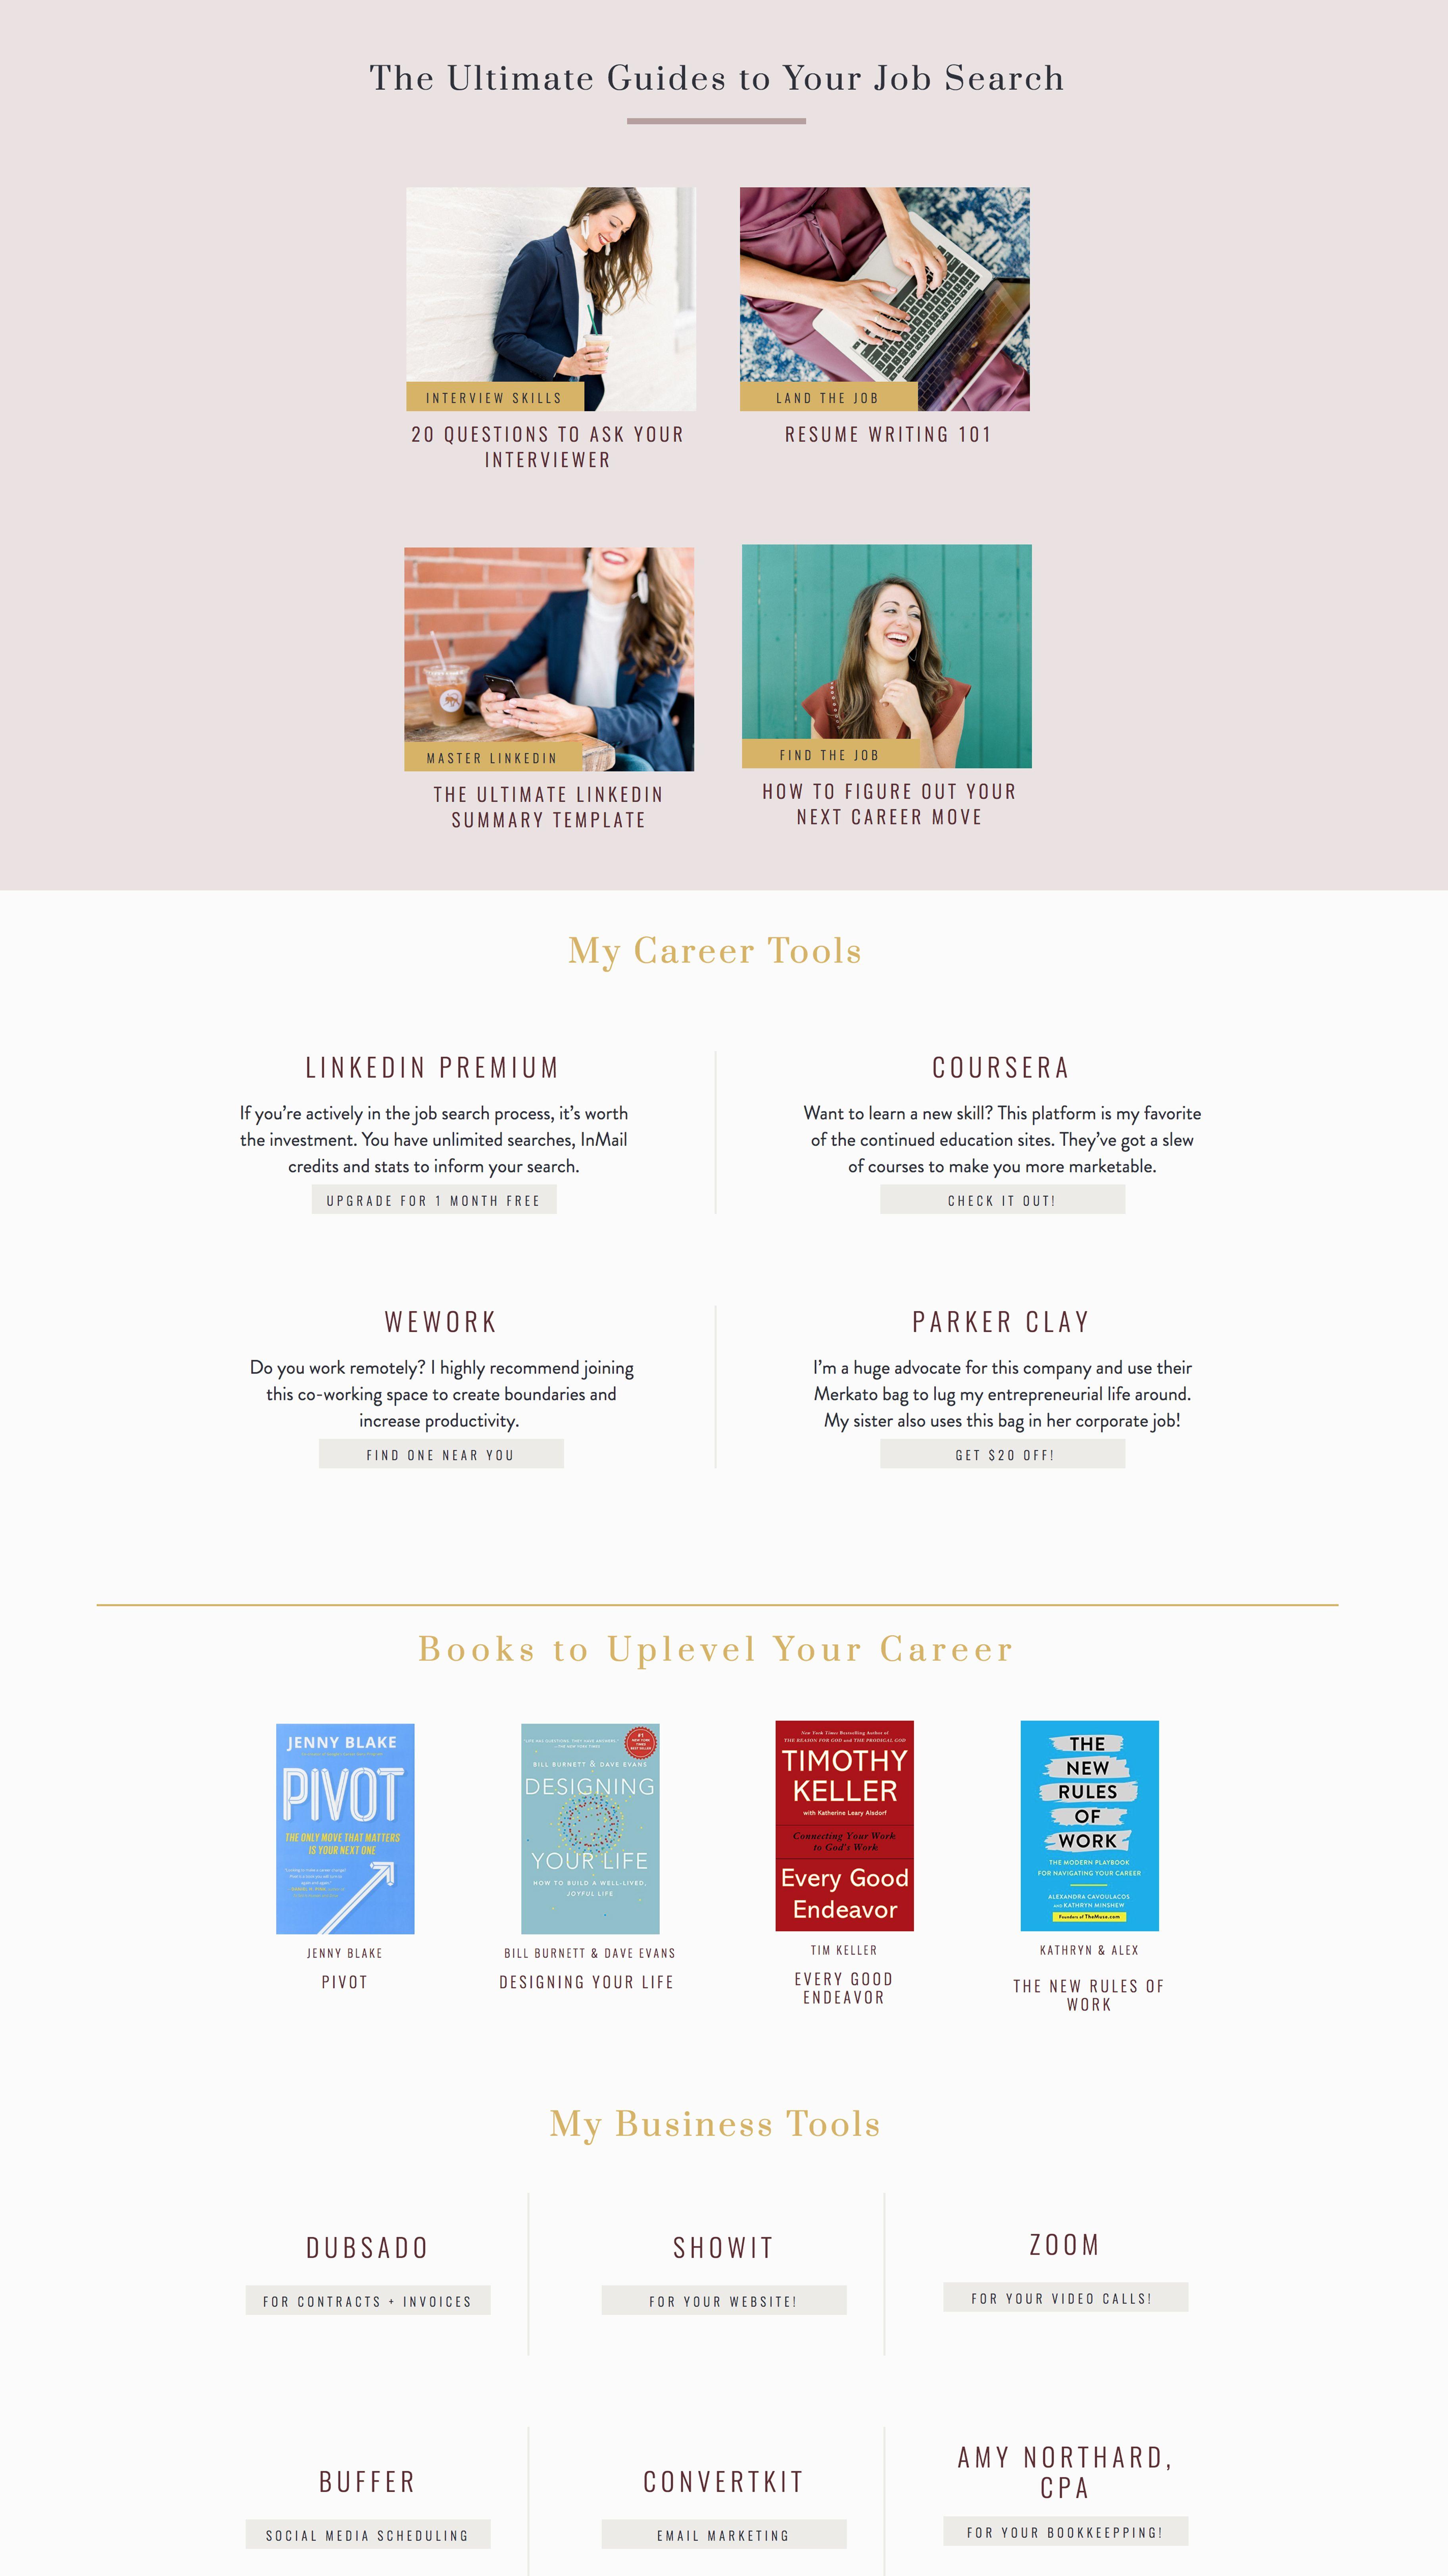 Resources Website Page Design For Successful Business And Career Coach Elizabeth Mccravy Designs Life Coach Websites Branding Website Design Website Branding